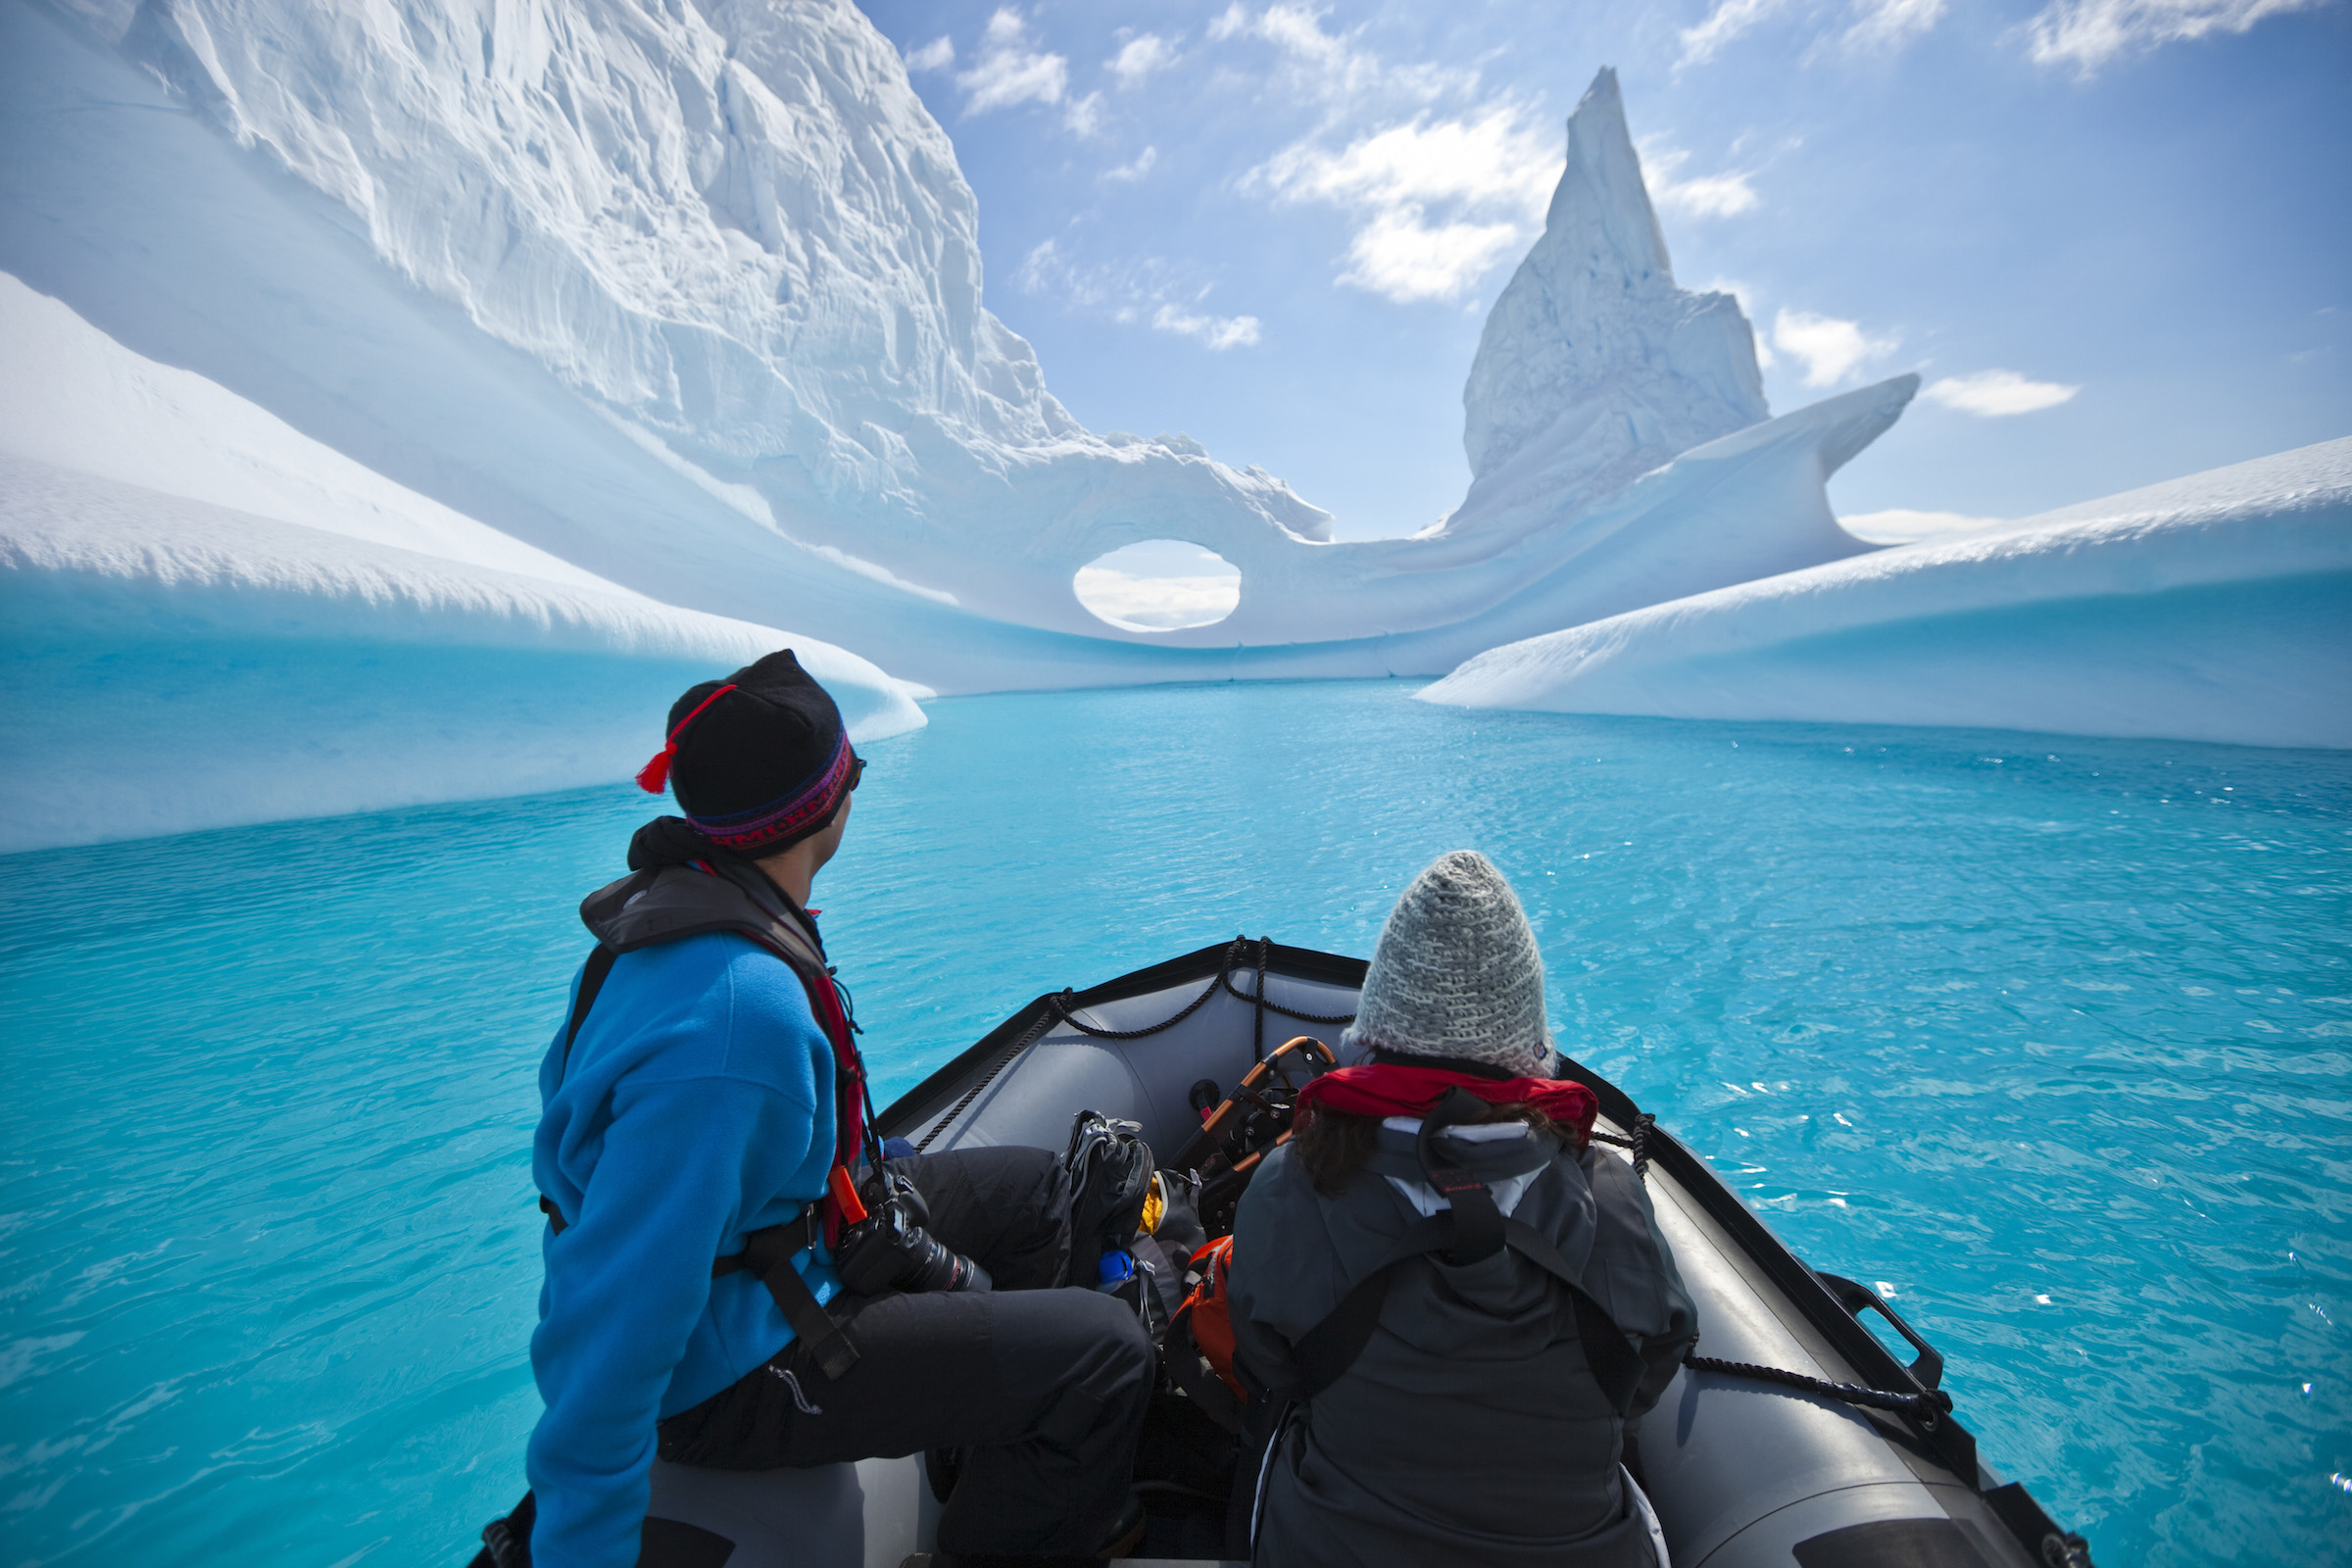 Cold water Iceberg_7033.jpg